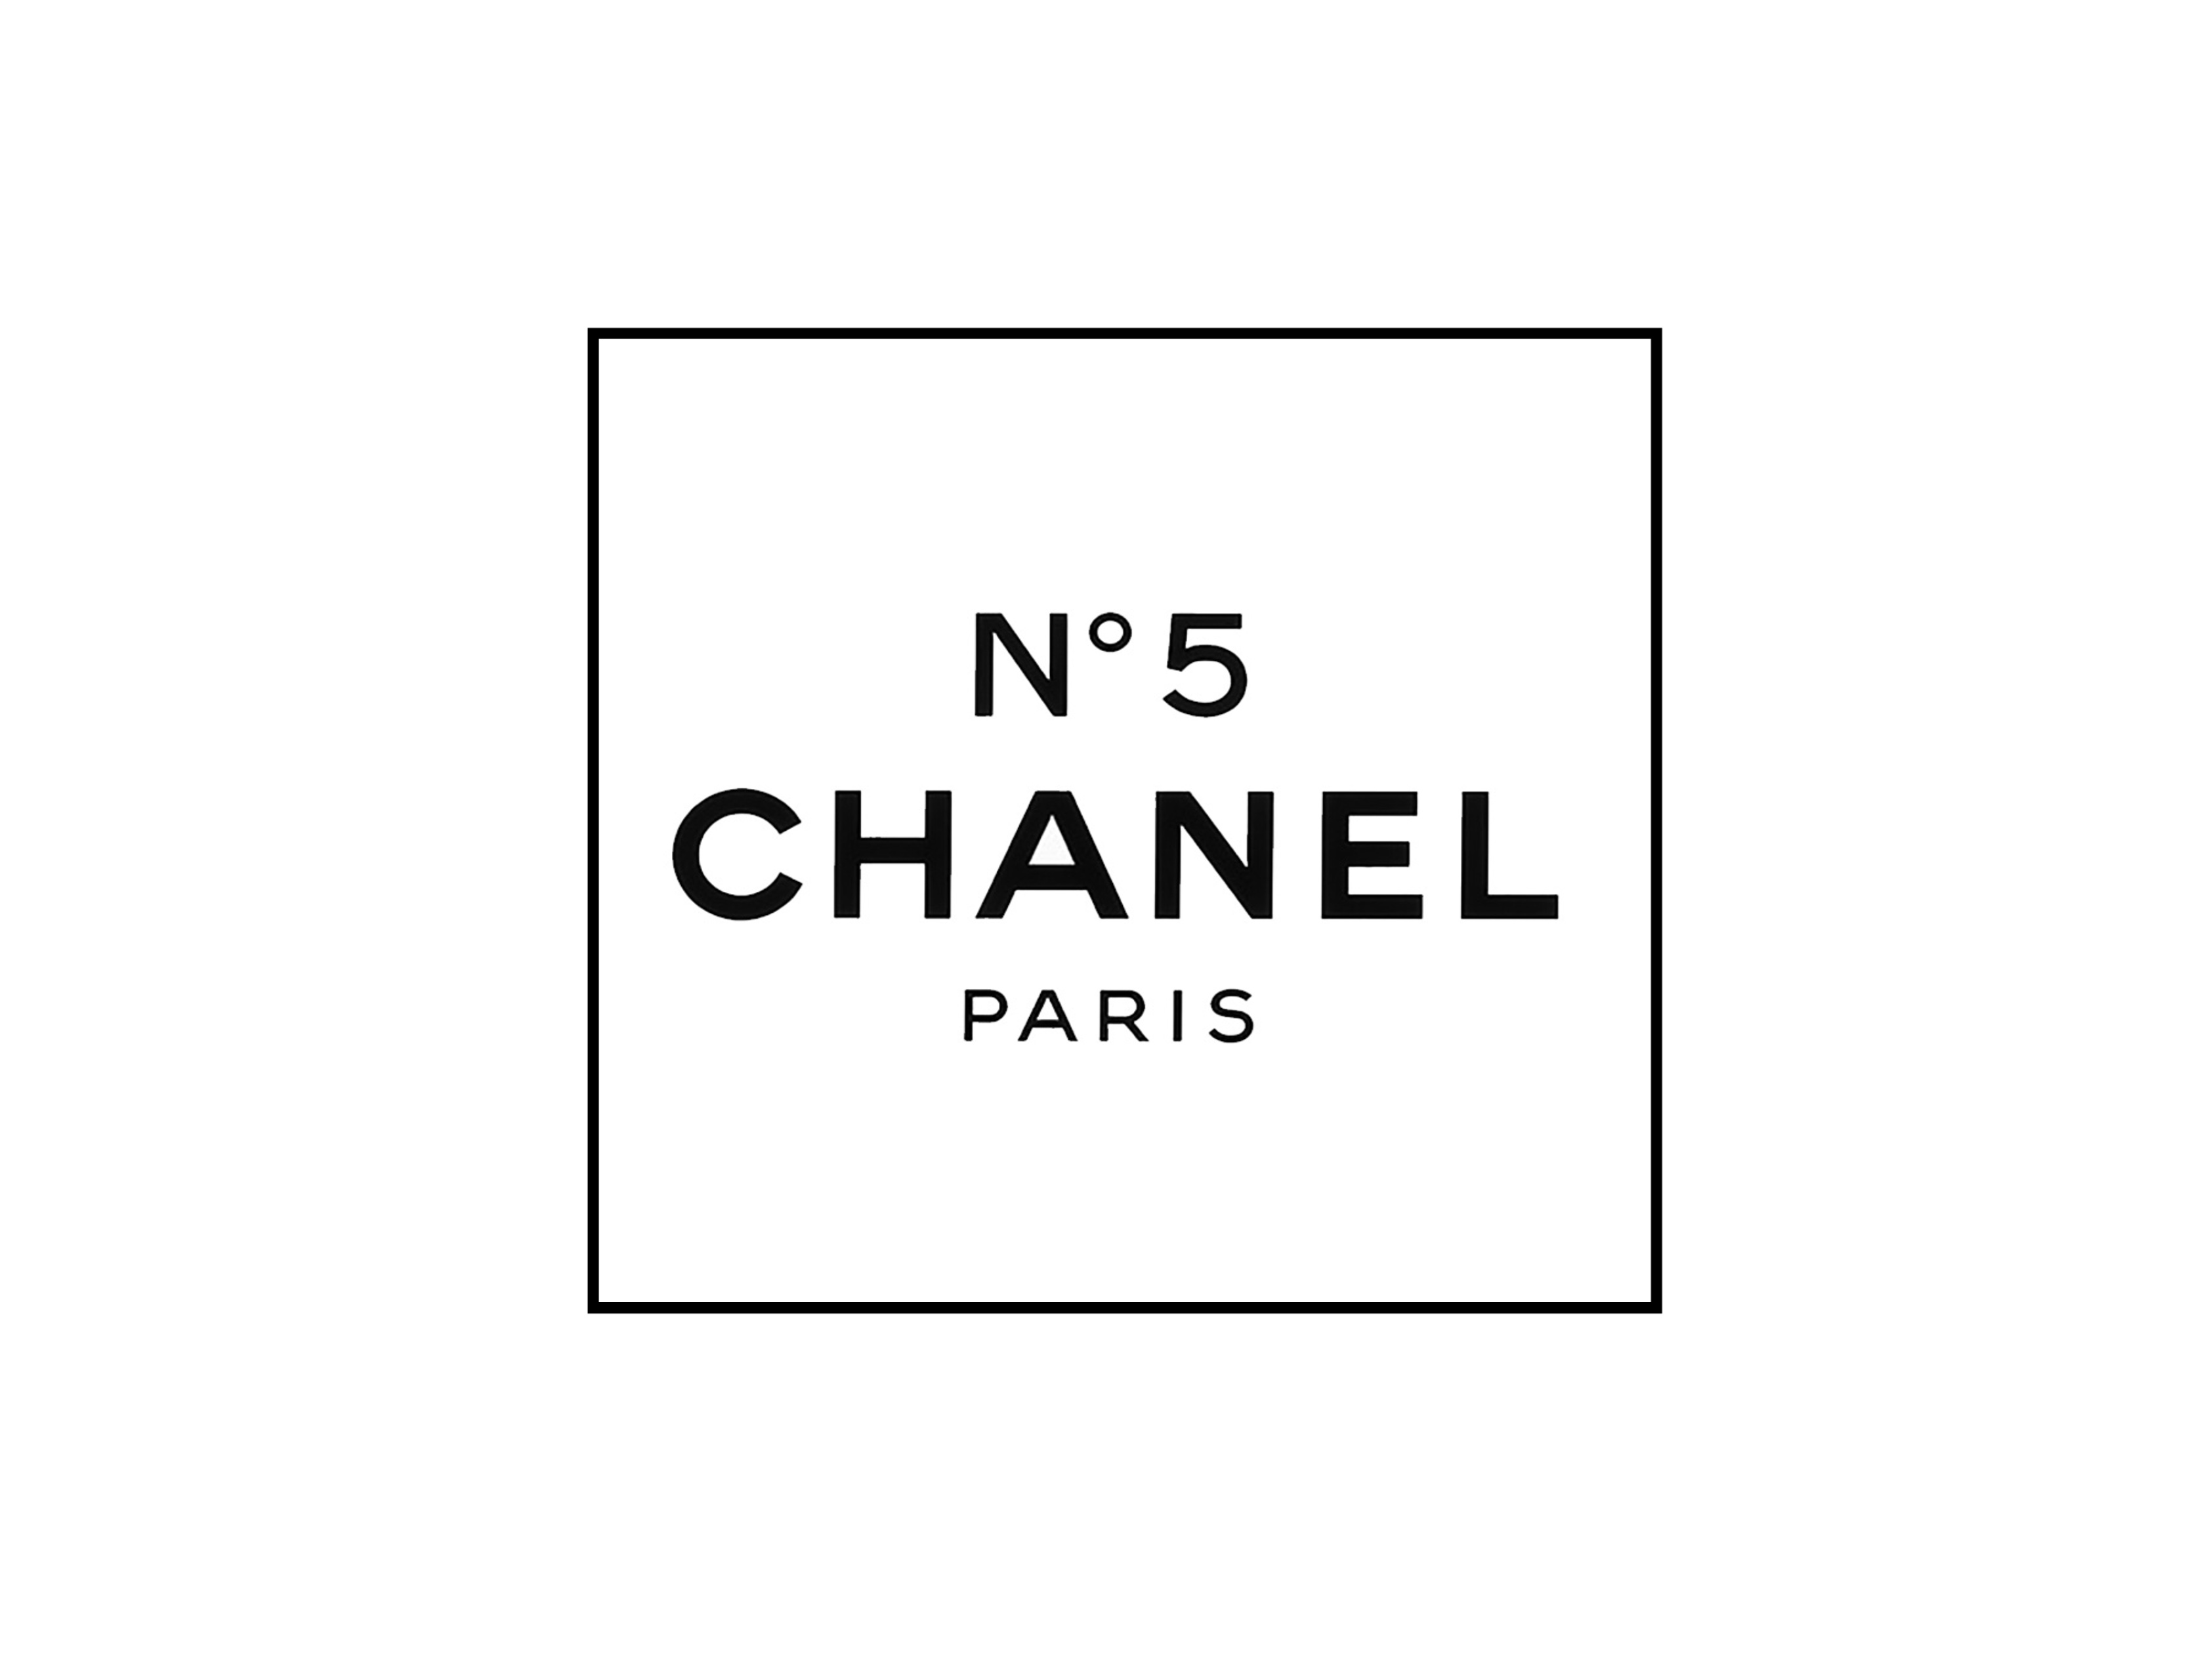 Chanel No 5 Label